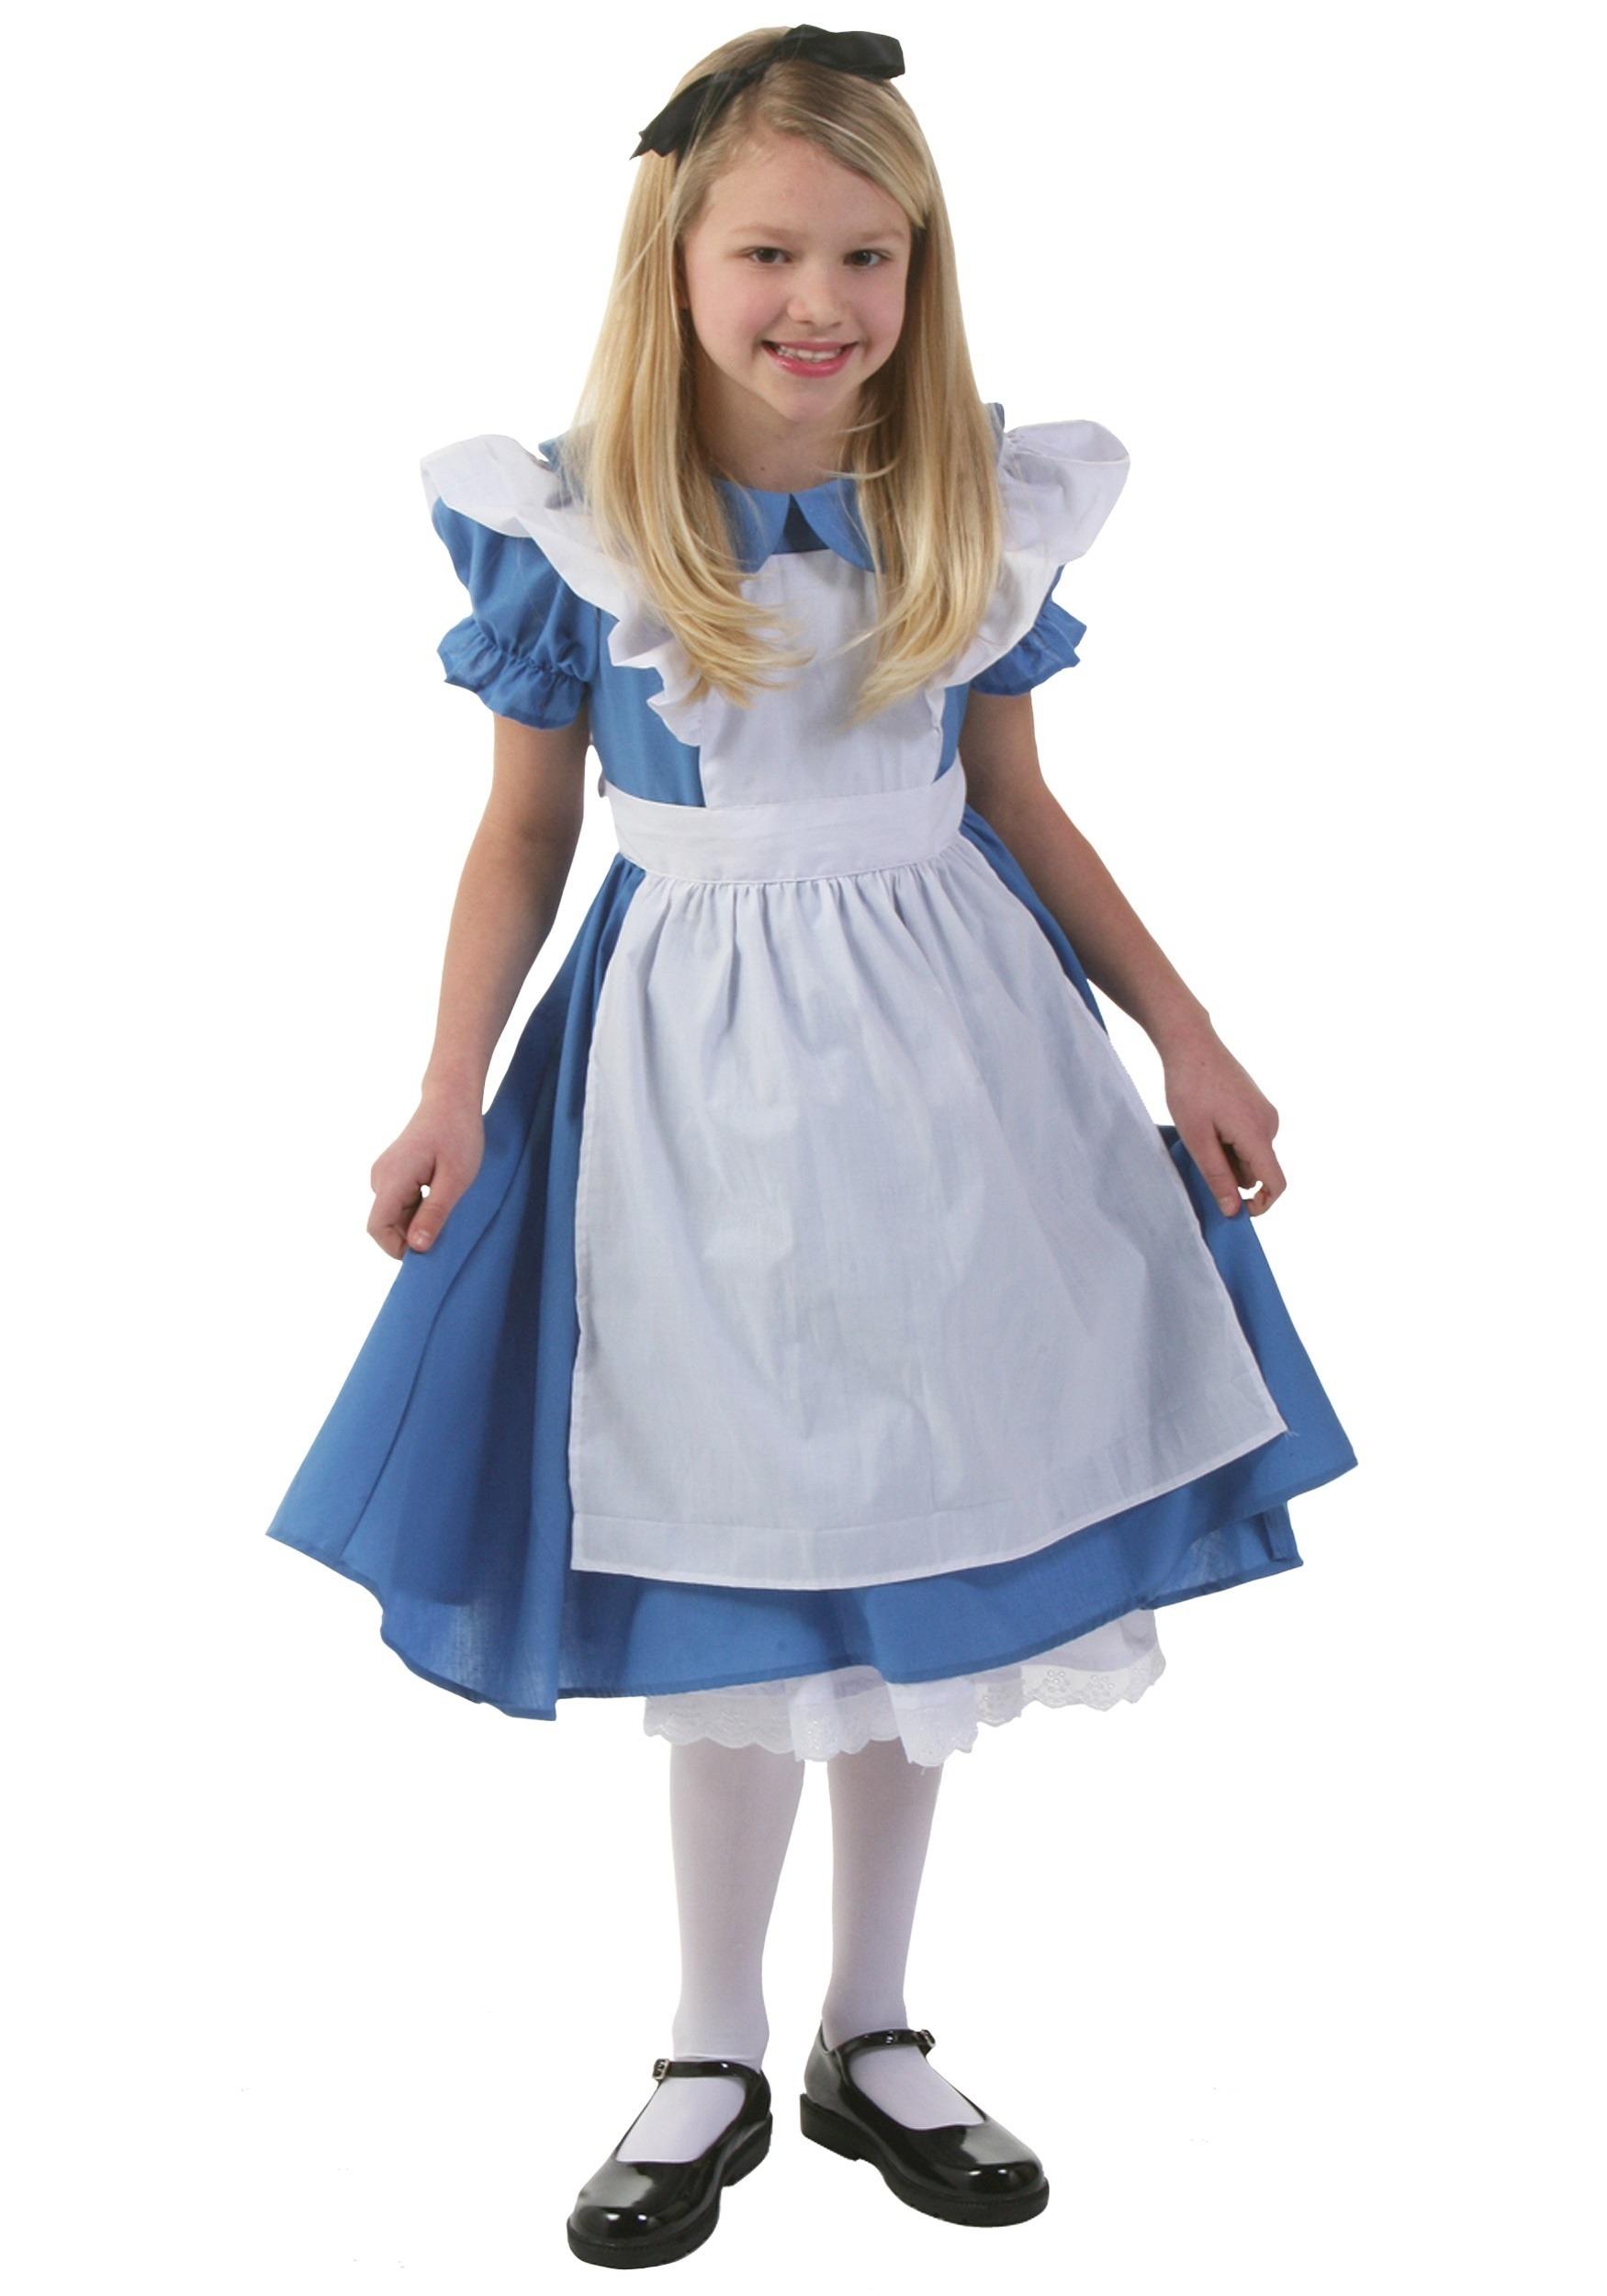 White apron alice wonderland costume - White Apron Alice Wonderland Costume 81